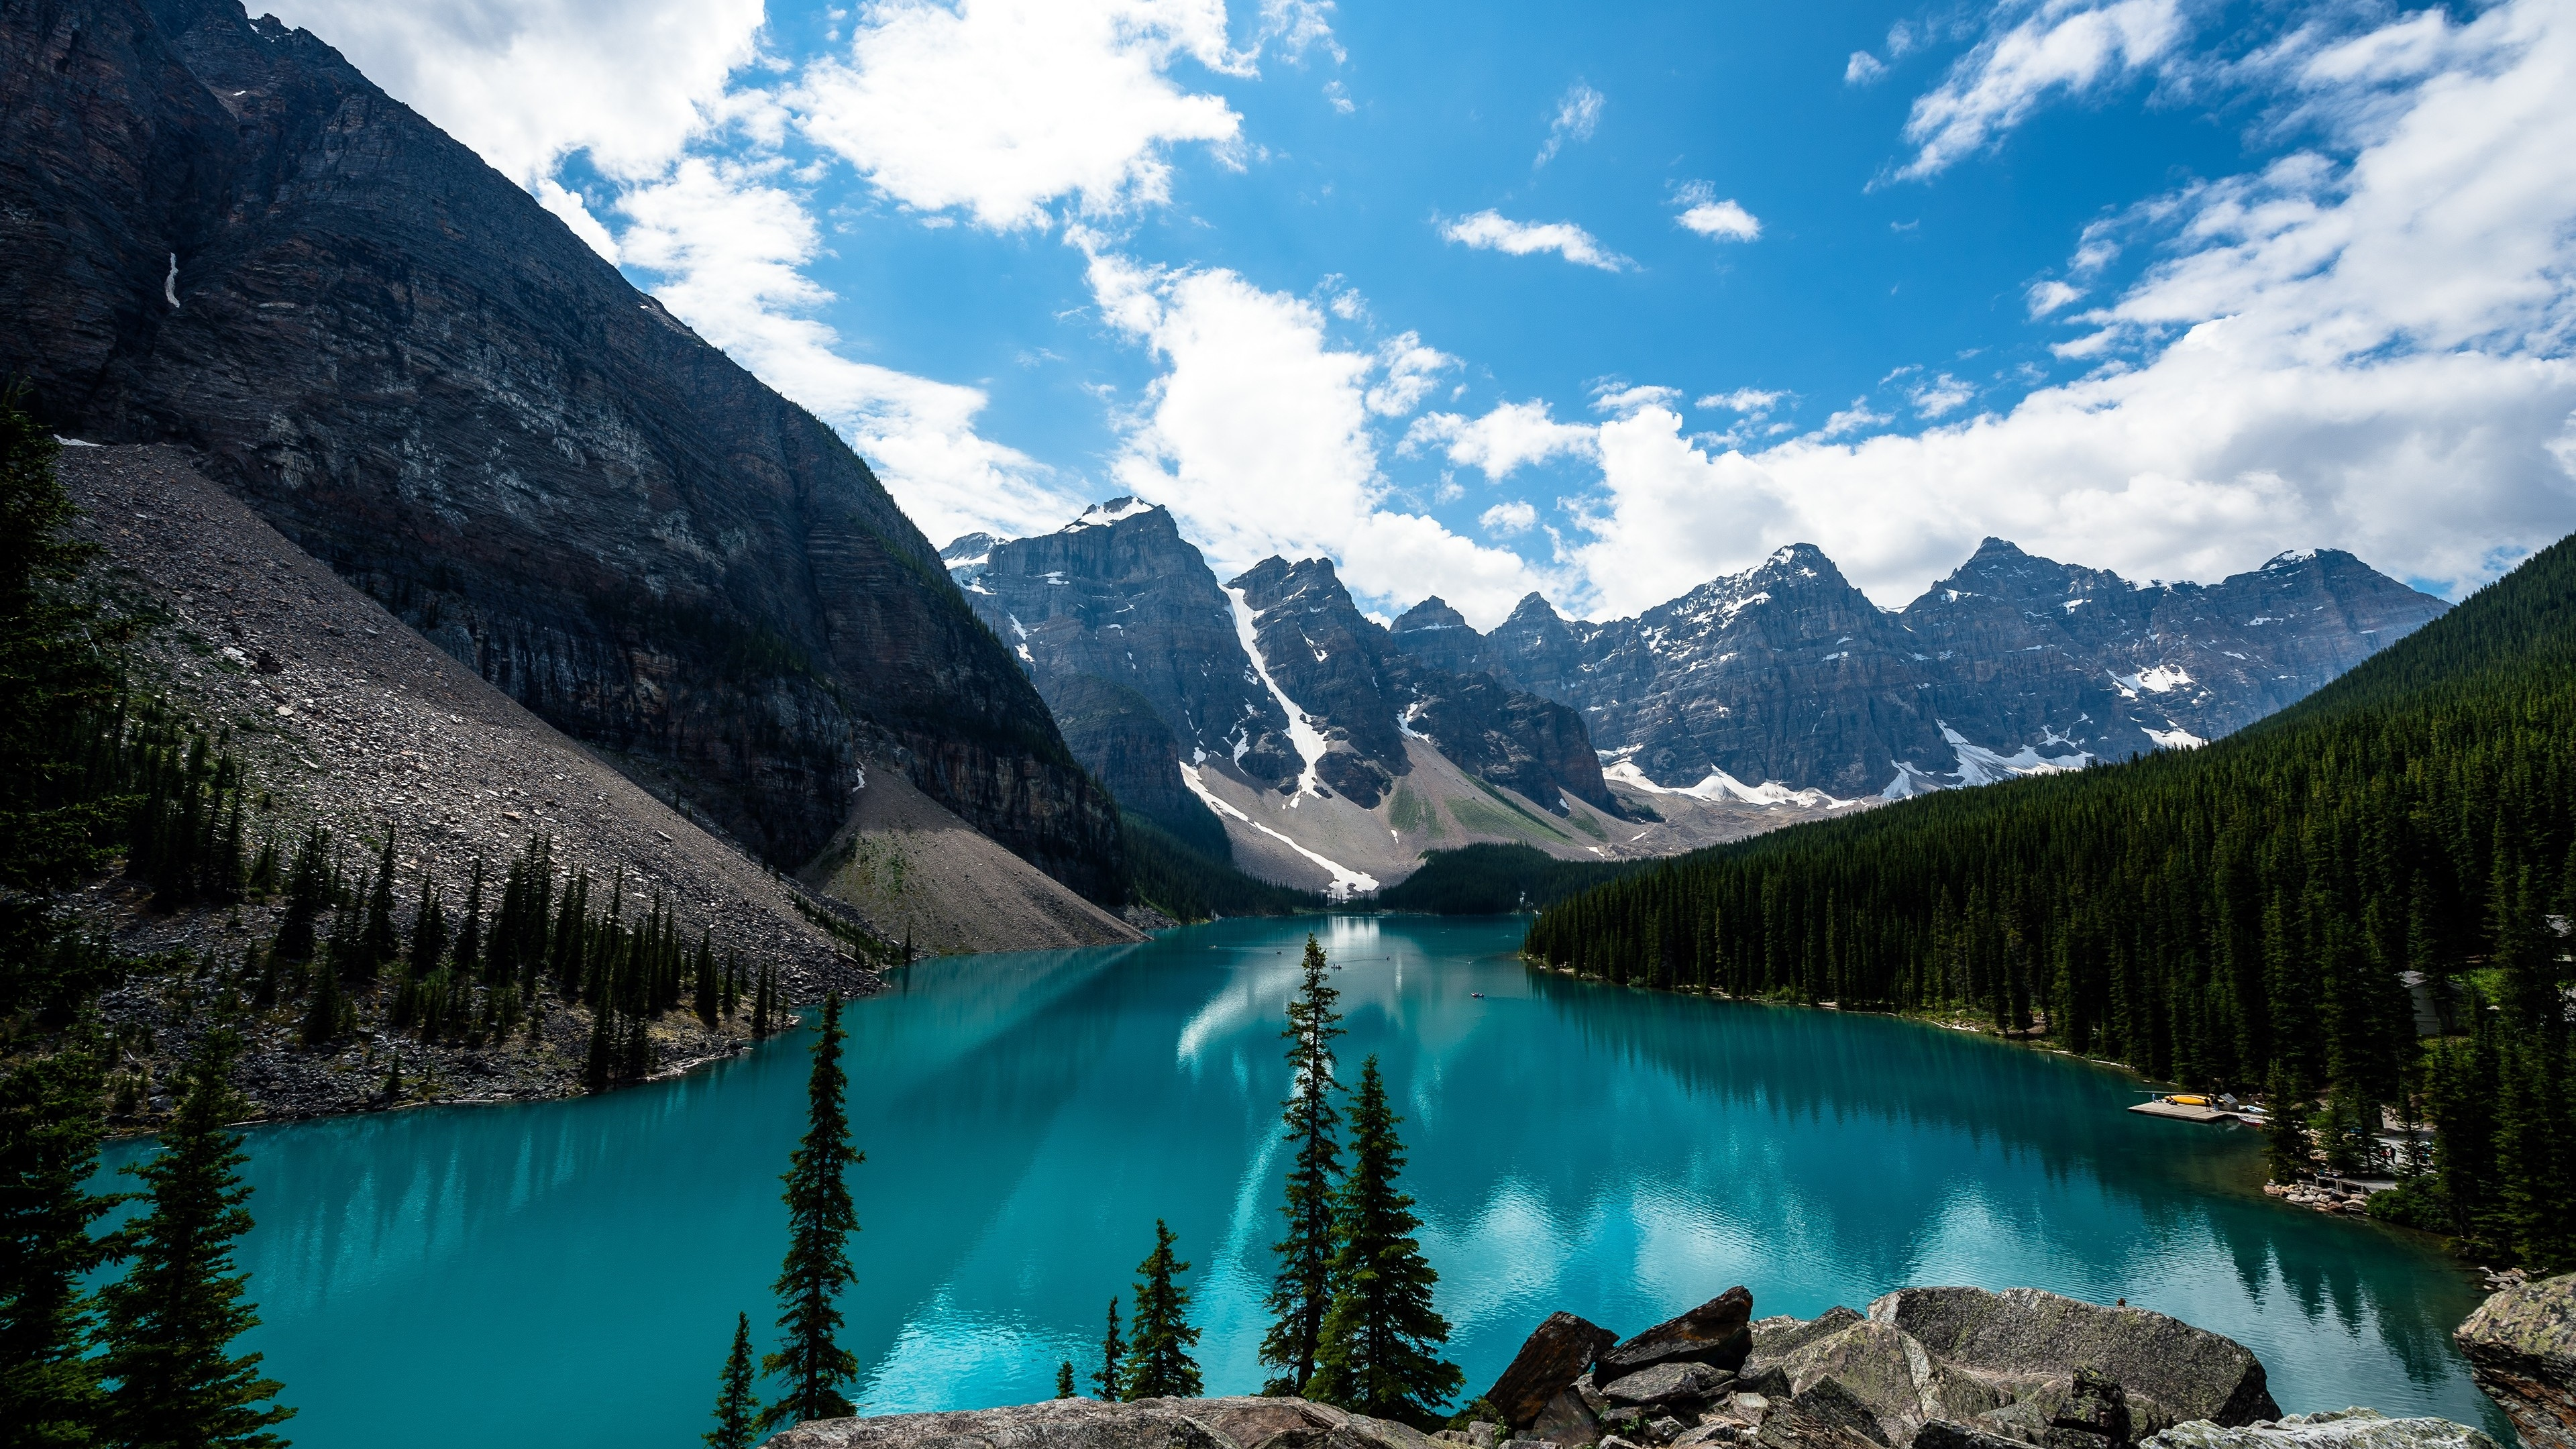 Lake Louise Canada 4K Ultra HD wallpaper 4k WallpaperNet 3840x2160